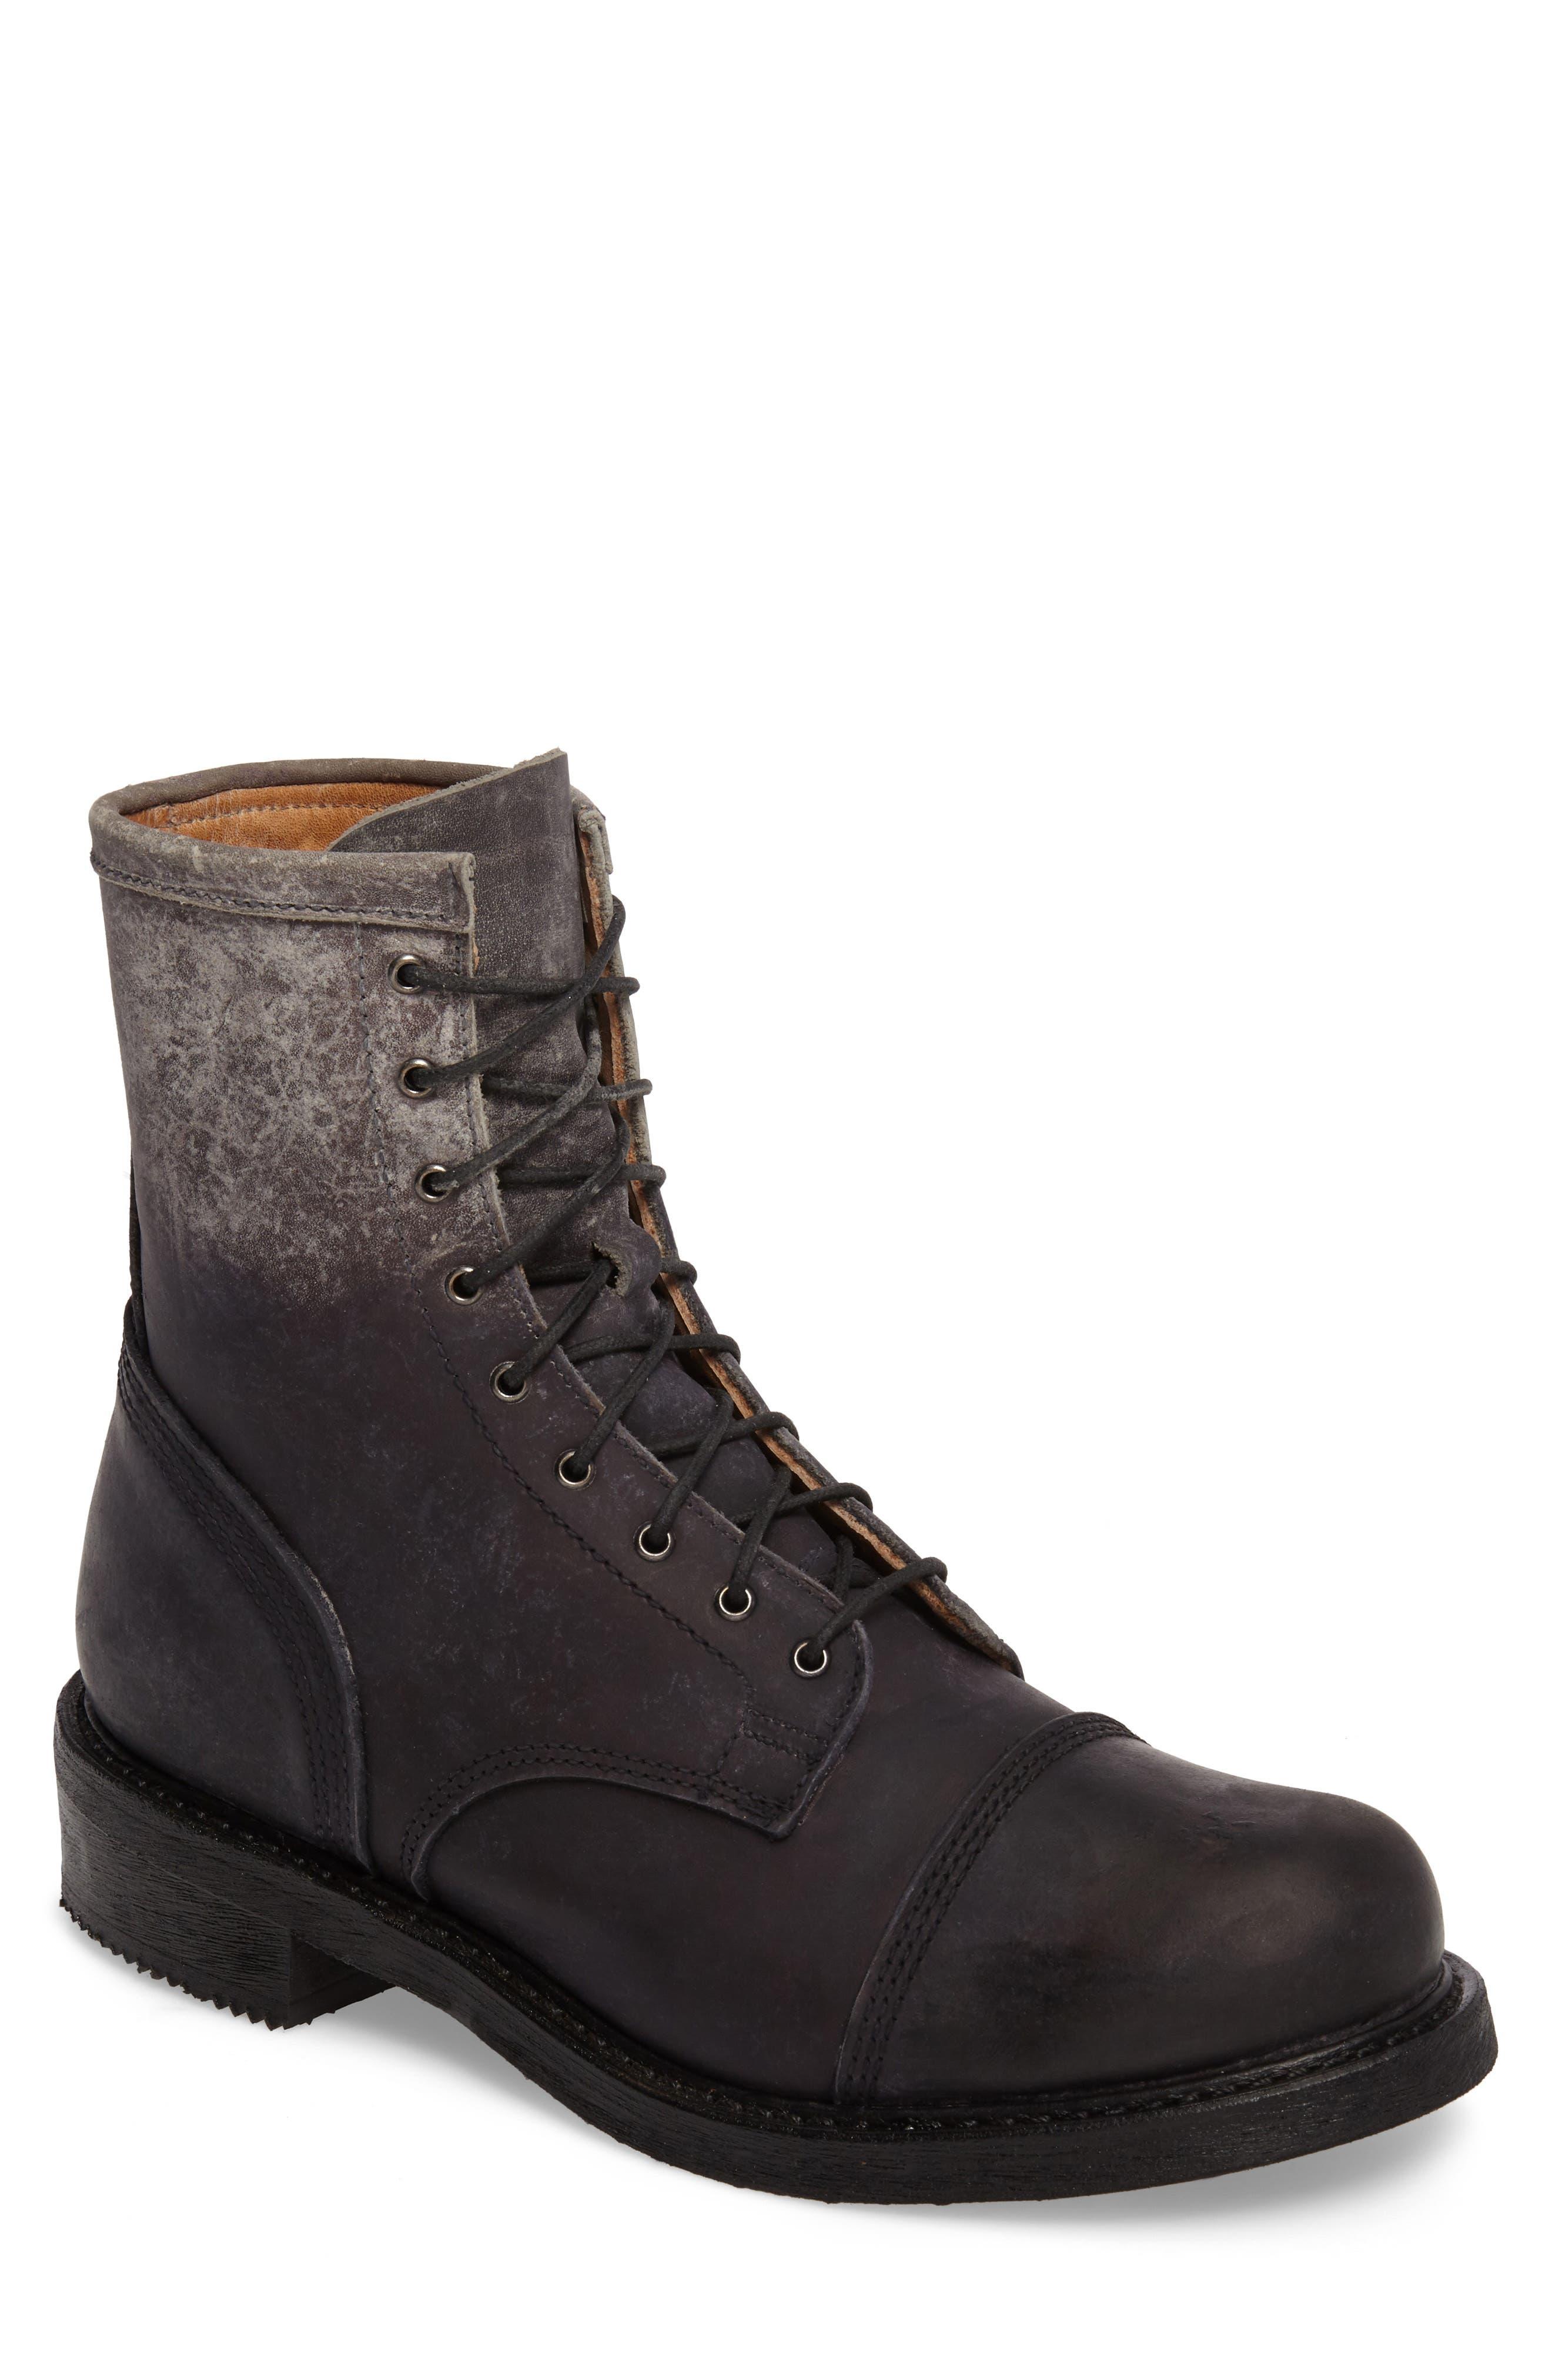 Smuggler's Notch Cap Toe Boot,                         Main,                         color, 020